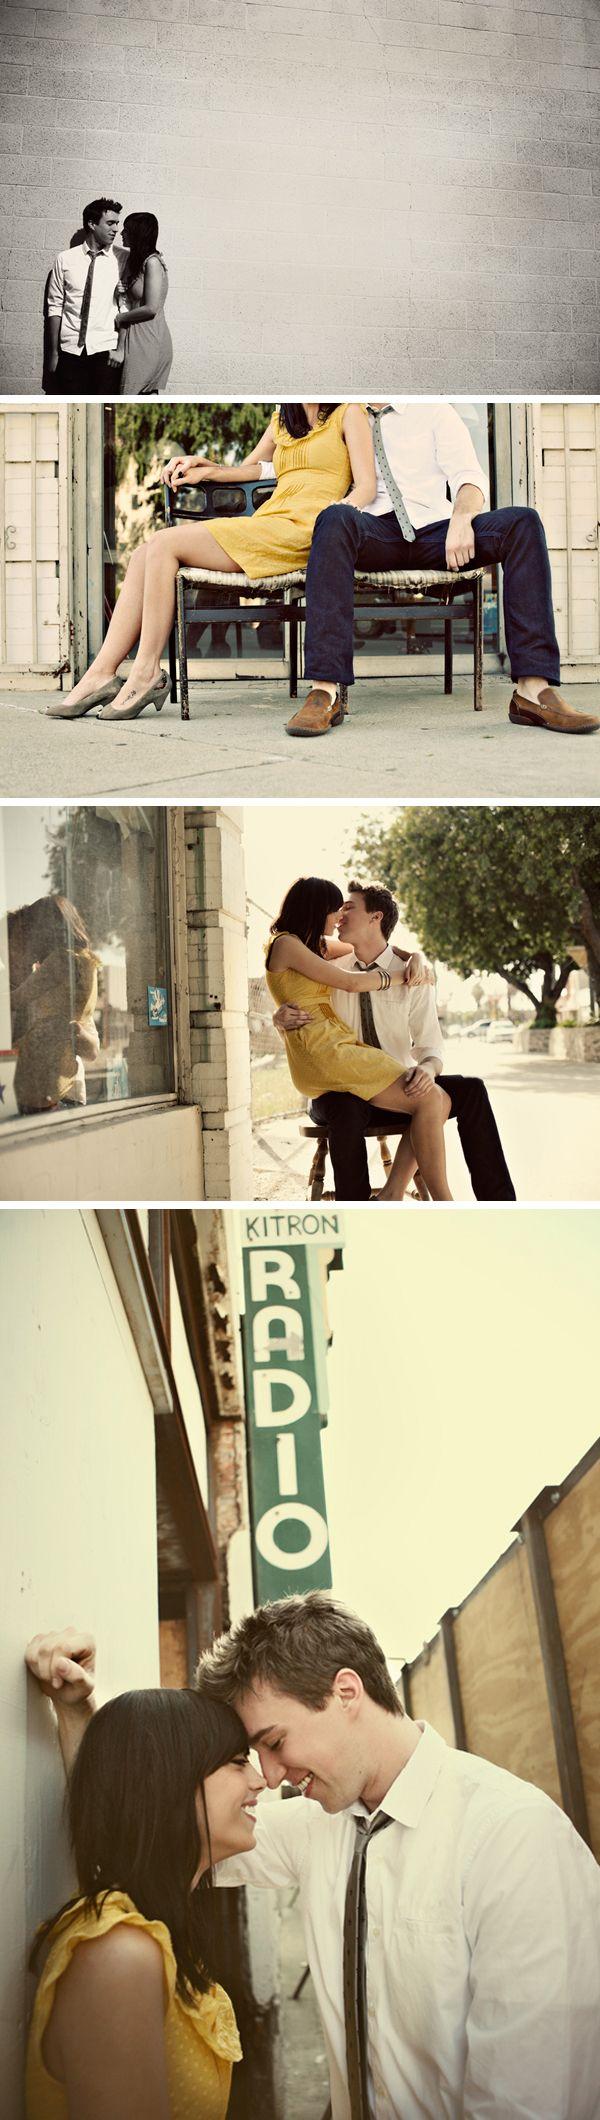 yellow dress - urban engagement